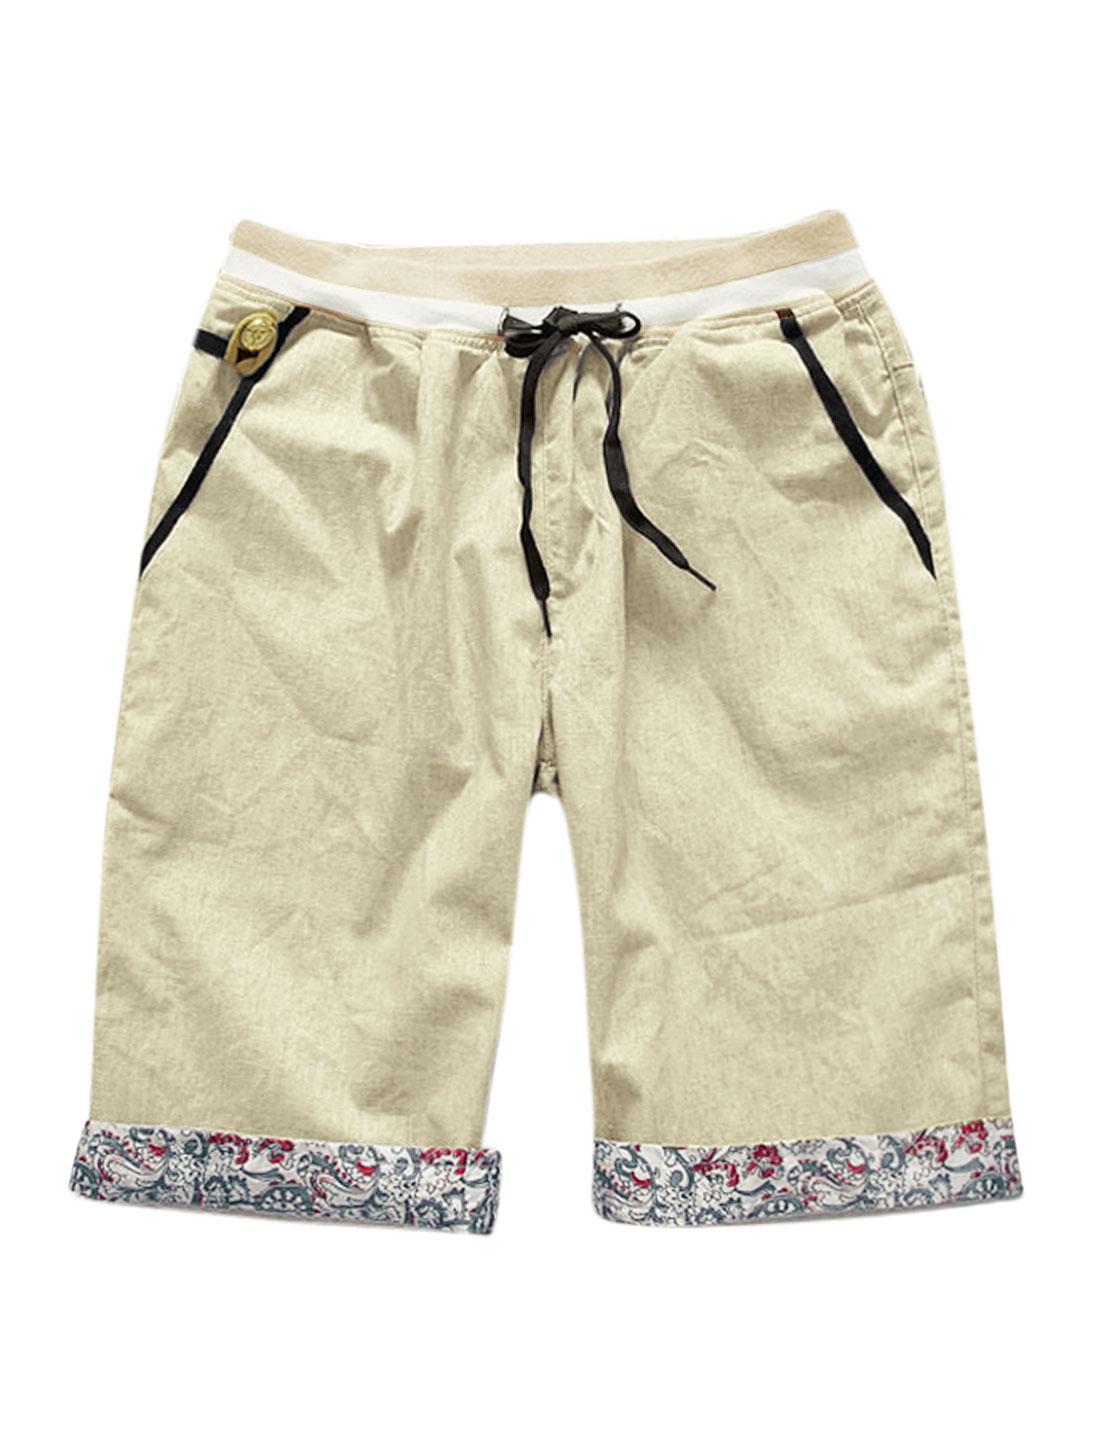 Man Ribbed Elastic Waist Band Slant Pockets Button Decor Casual Shorts Khaki W34